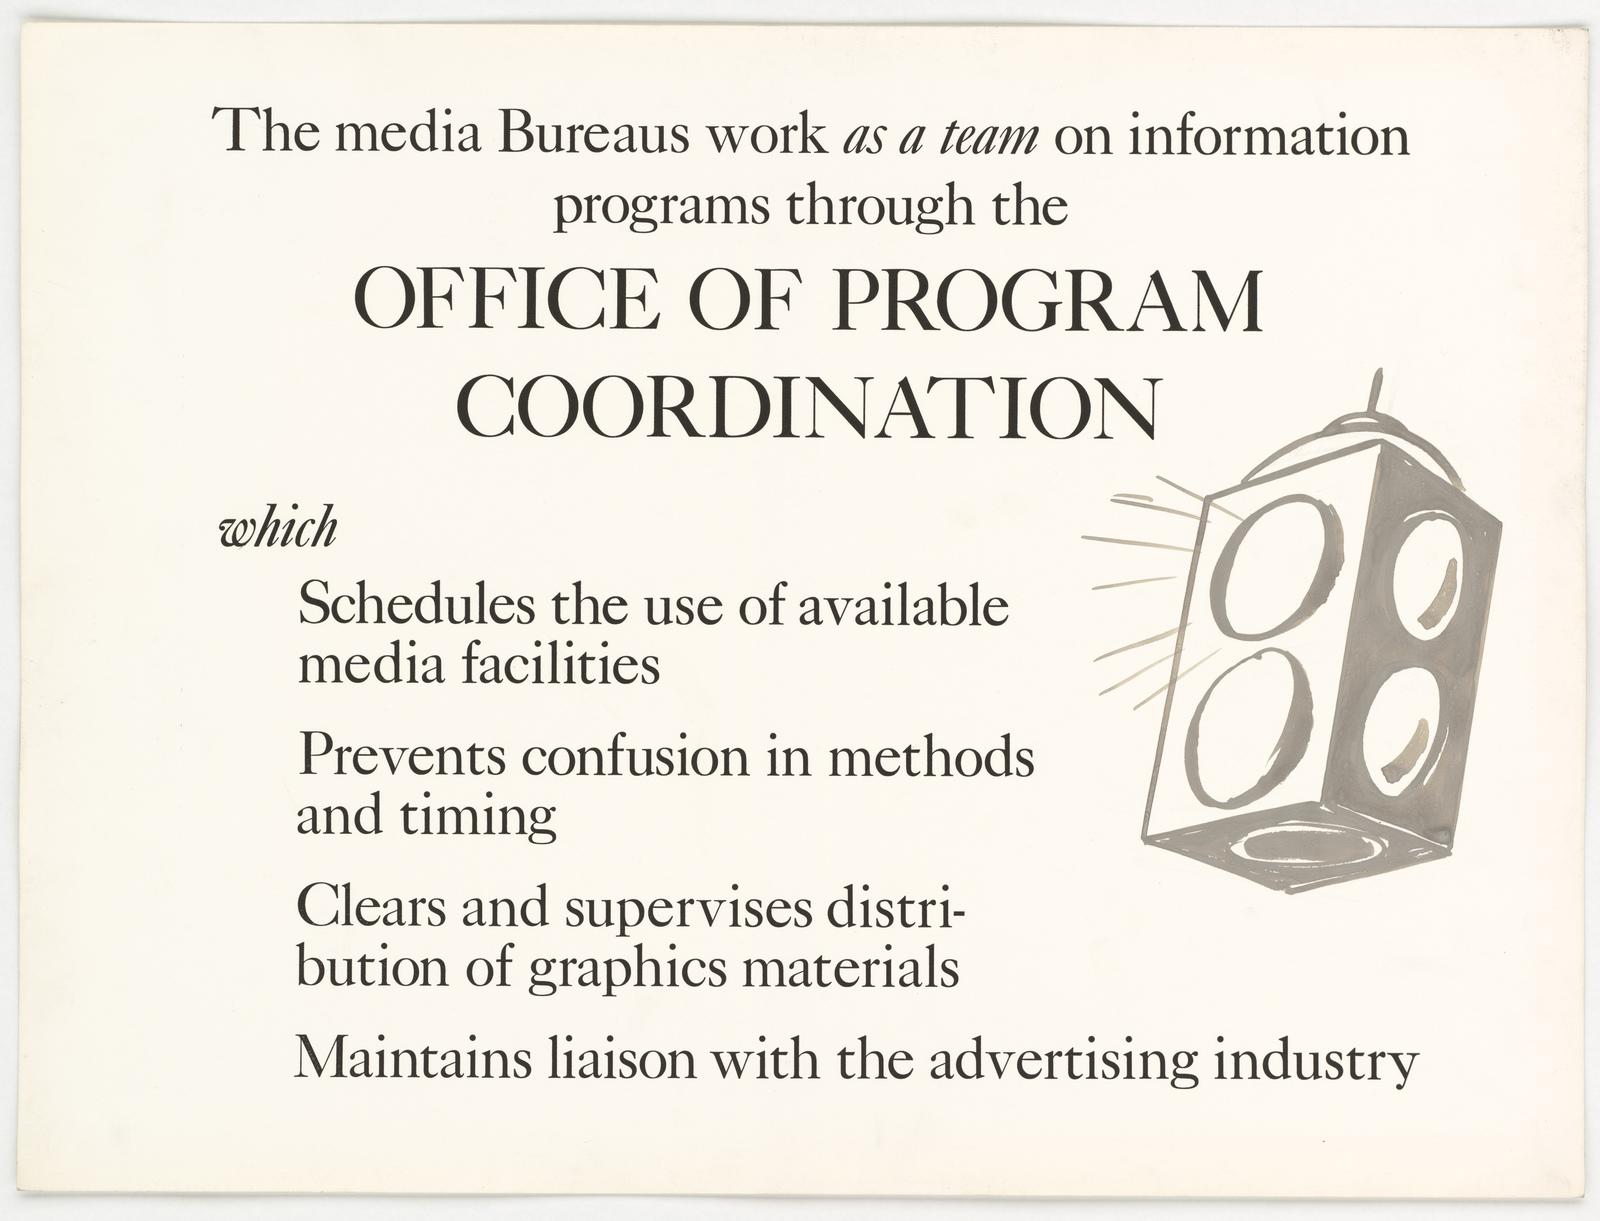 OFFICE OF PROGRAM COORDINATION